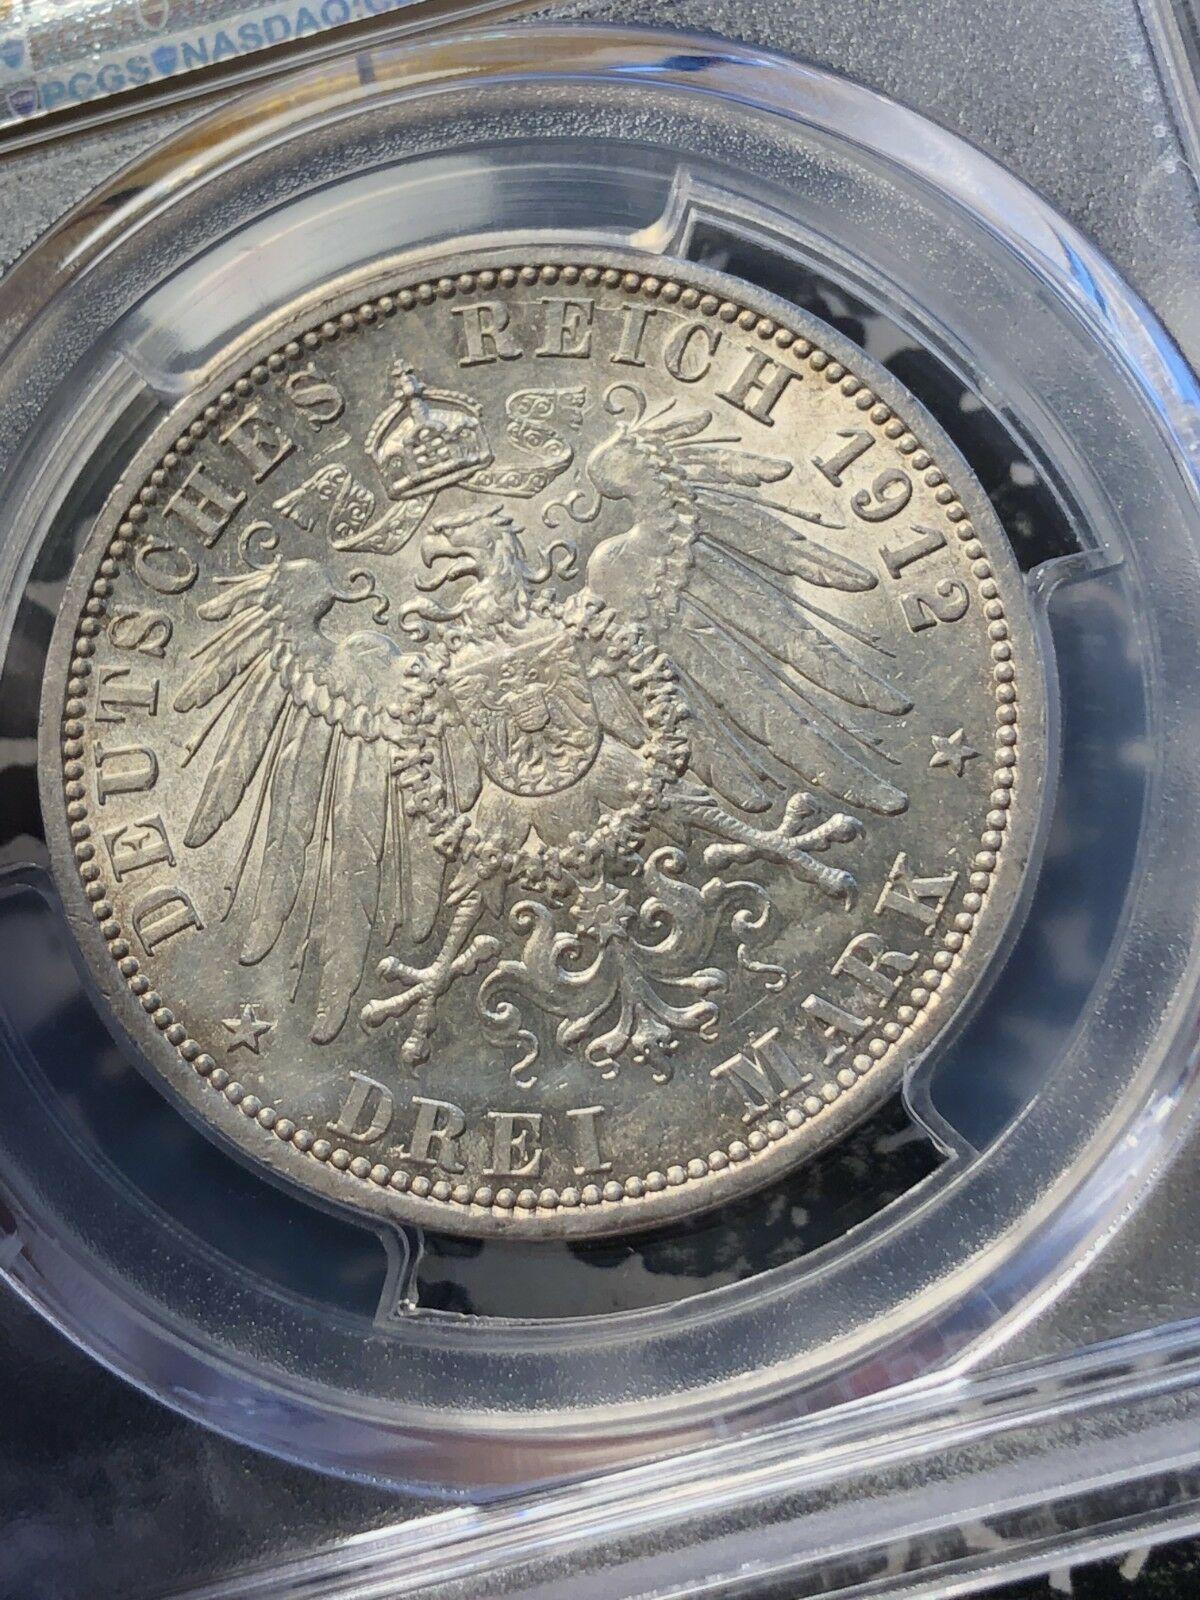 1912-a Germania Prussia 3 Marks PCGS Ms62 Lotto #G013 Argento! Colorato